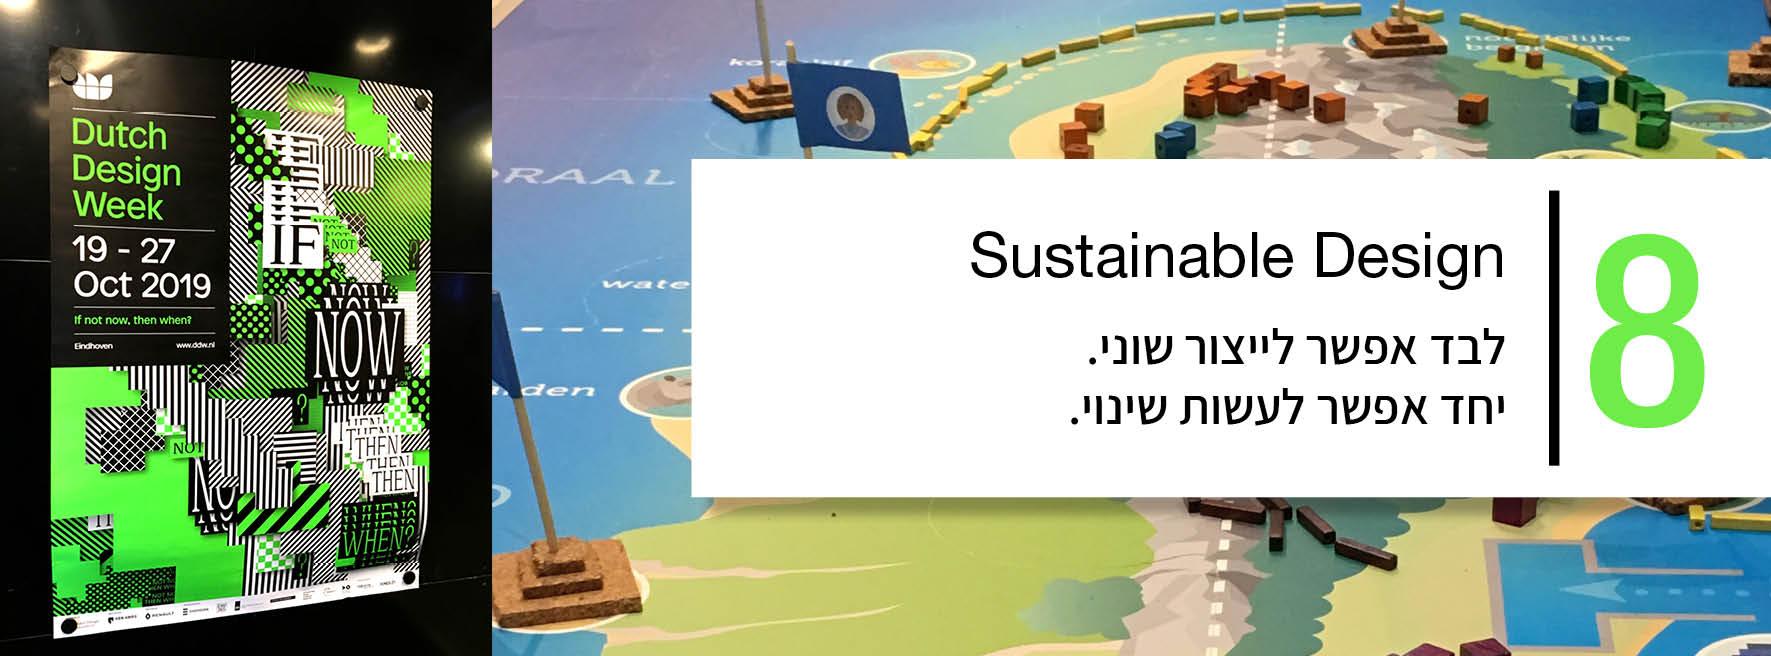 Embassy of Sustainable Design. לבד אפשר לייצור שוני. יחד אפשר לעשות שינוי.